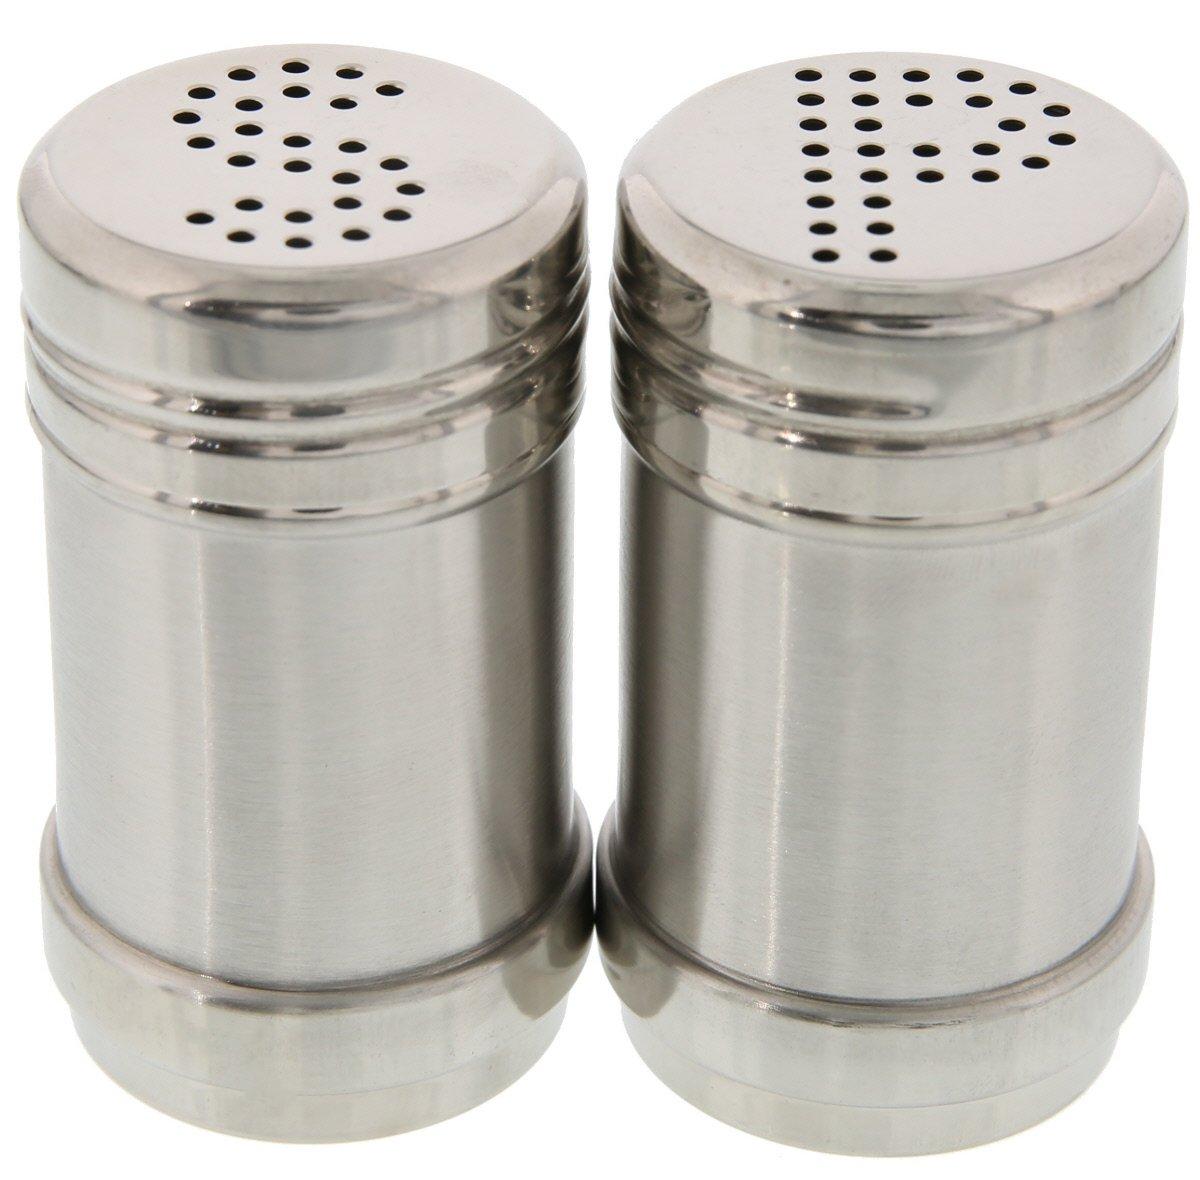 Juvale Salt Pepper Shakers - Modern Kitchen Stainless Steel Salt Pepper Shakers - 3.5 inch COMINHKPR82642